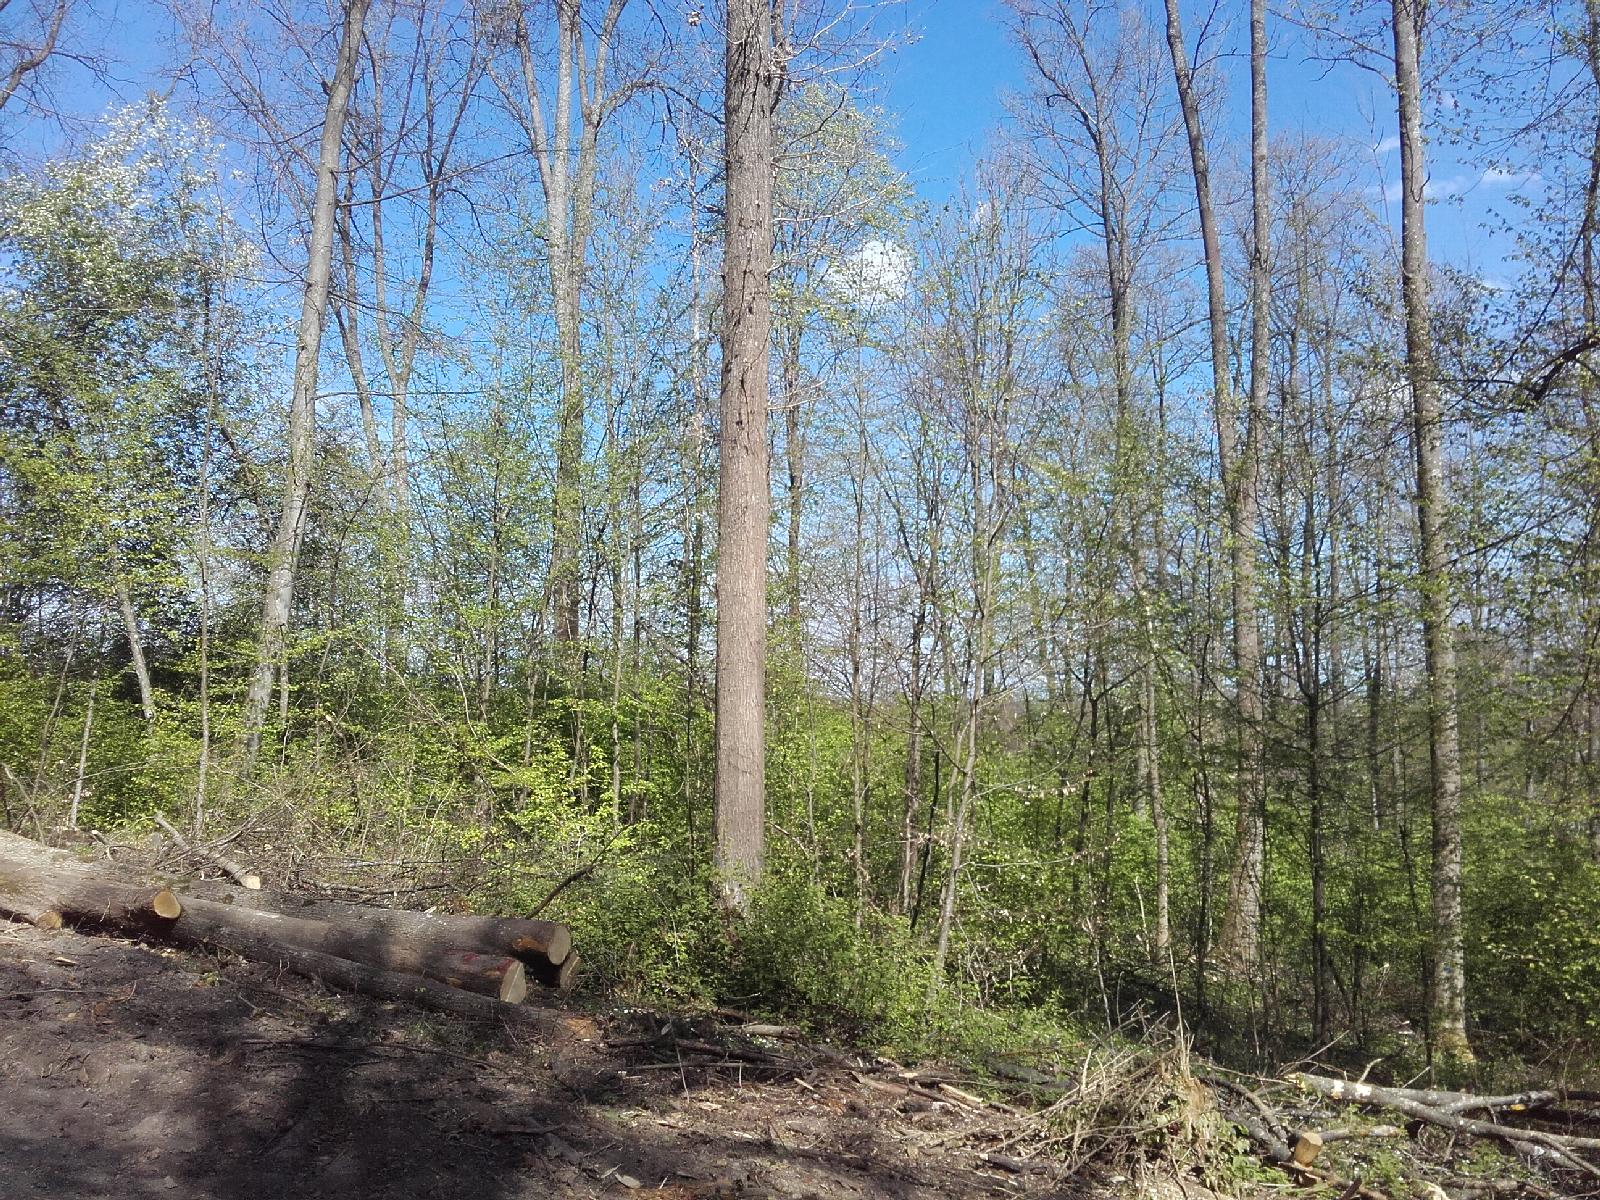 Altholz mit Naturverjüngung